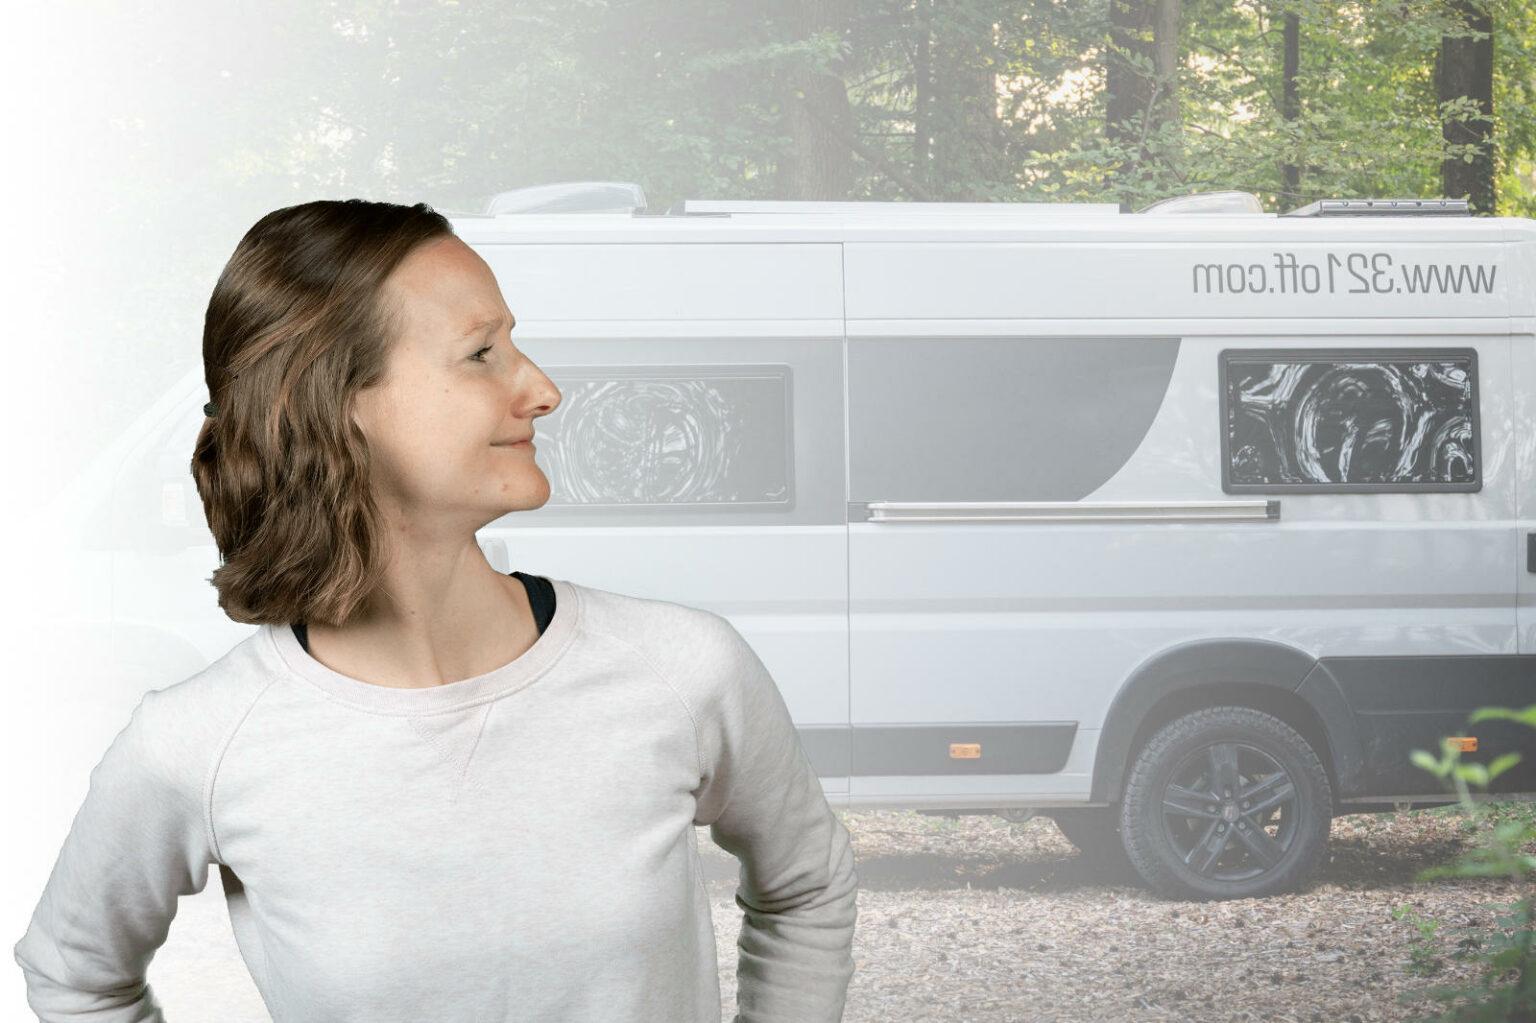 Kfz Steuer Wohnmobil - Erhöhung ab 2021? - 321off.com